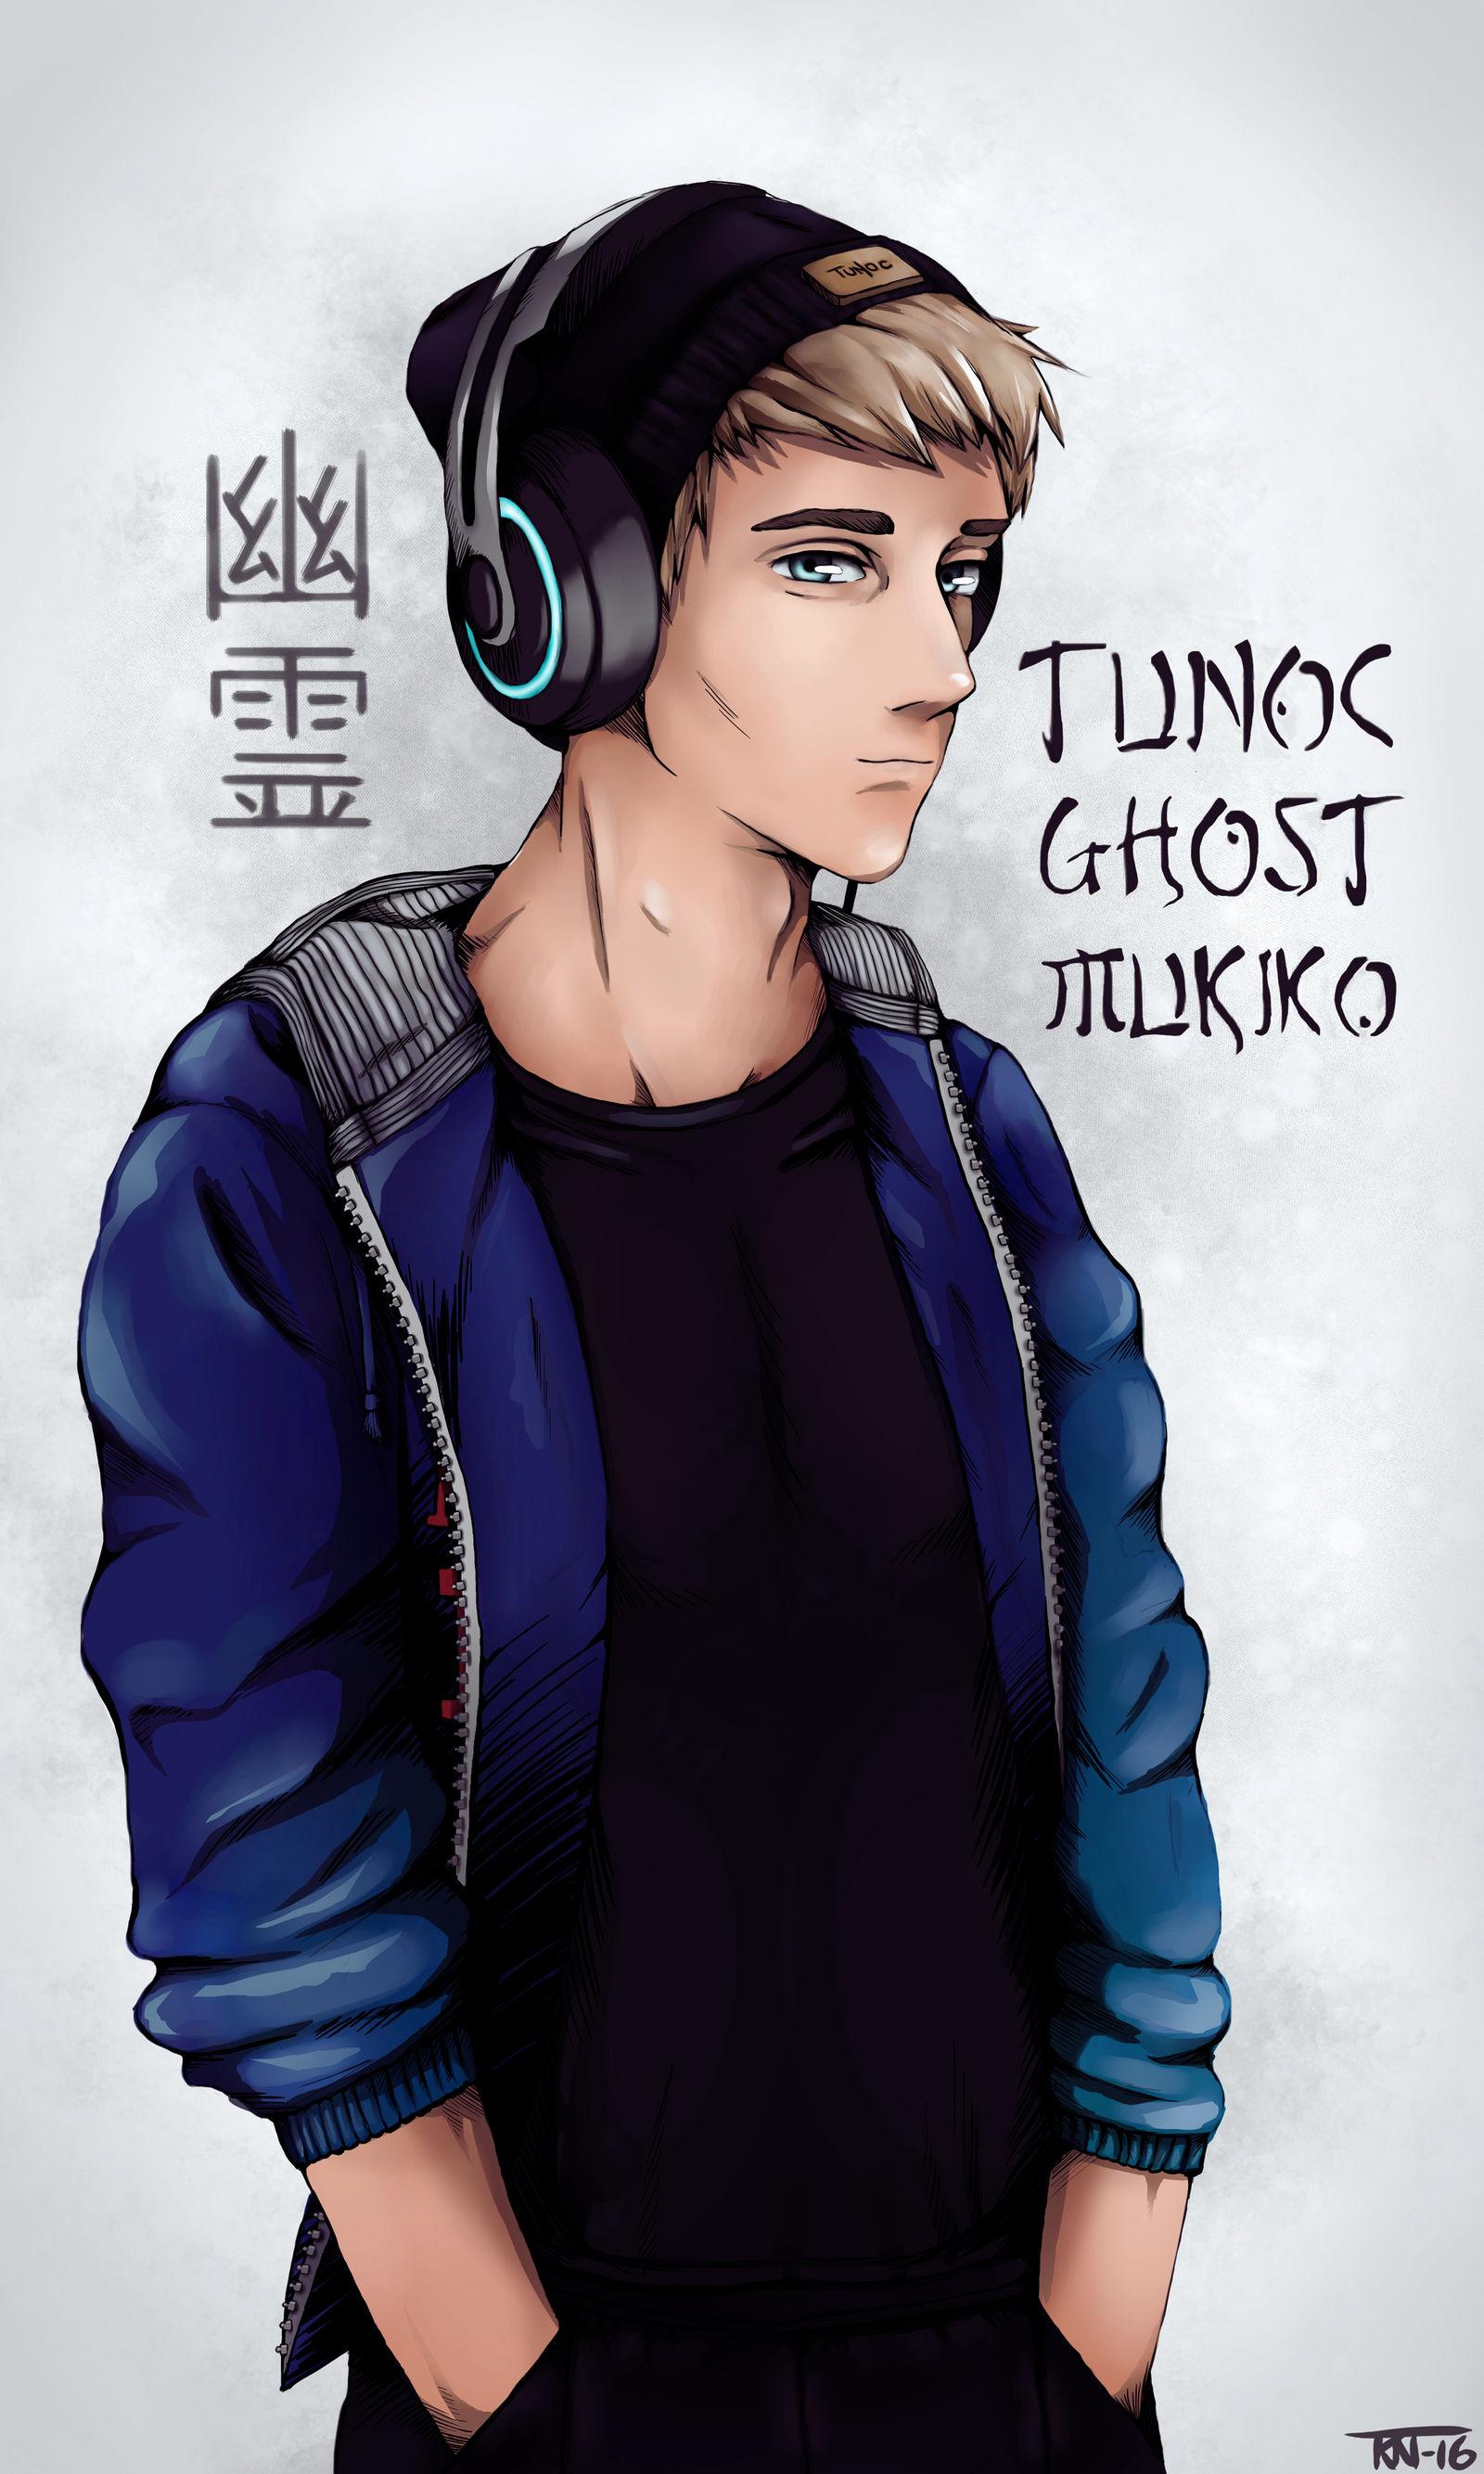 Tunoc Ghost Mukiko (colored version) by trinemusen1